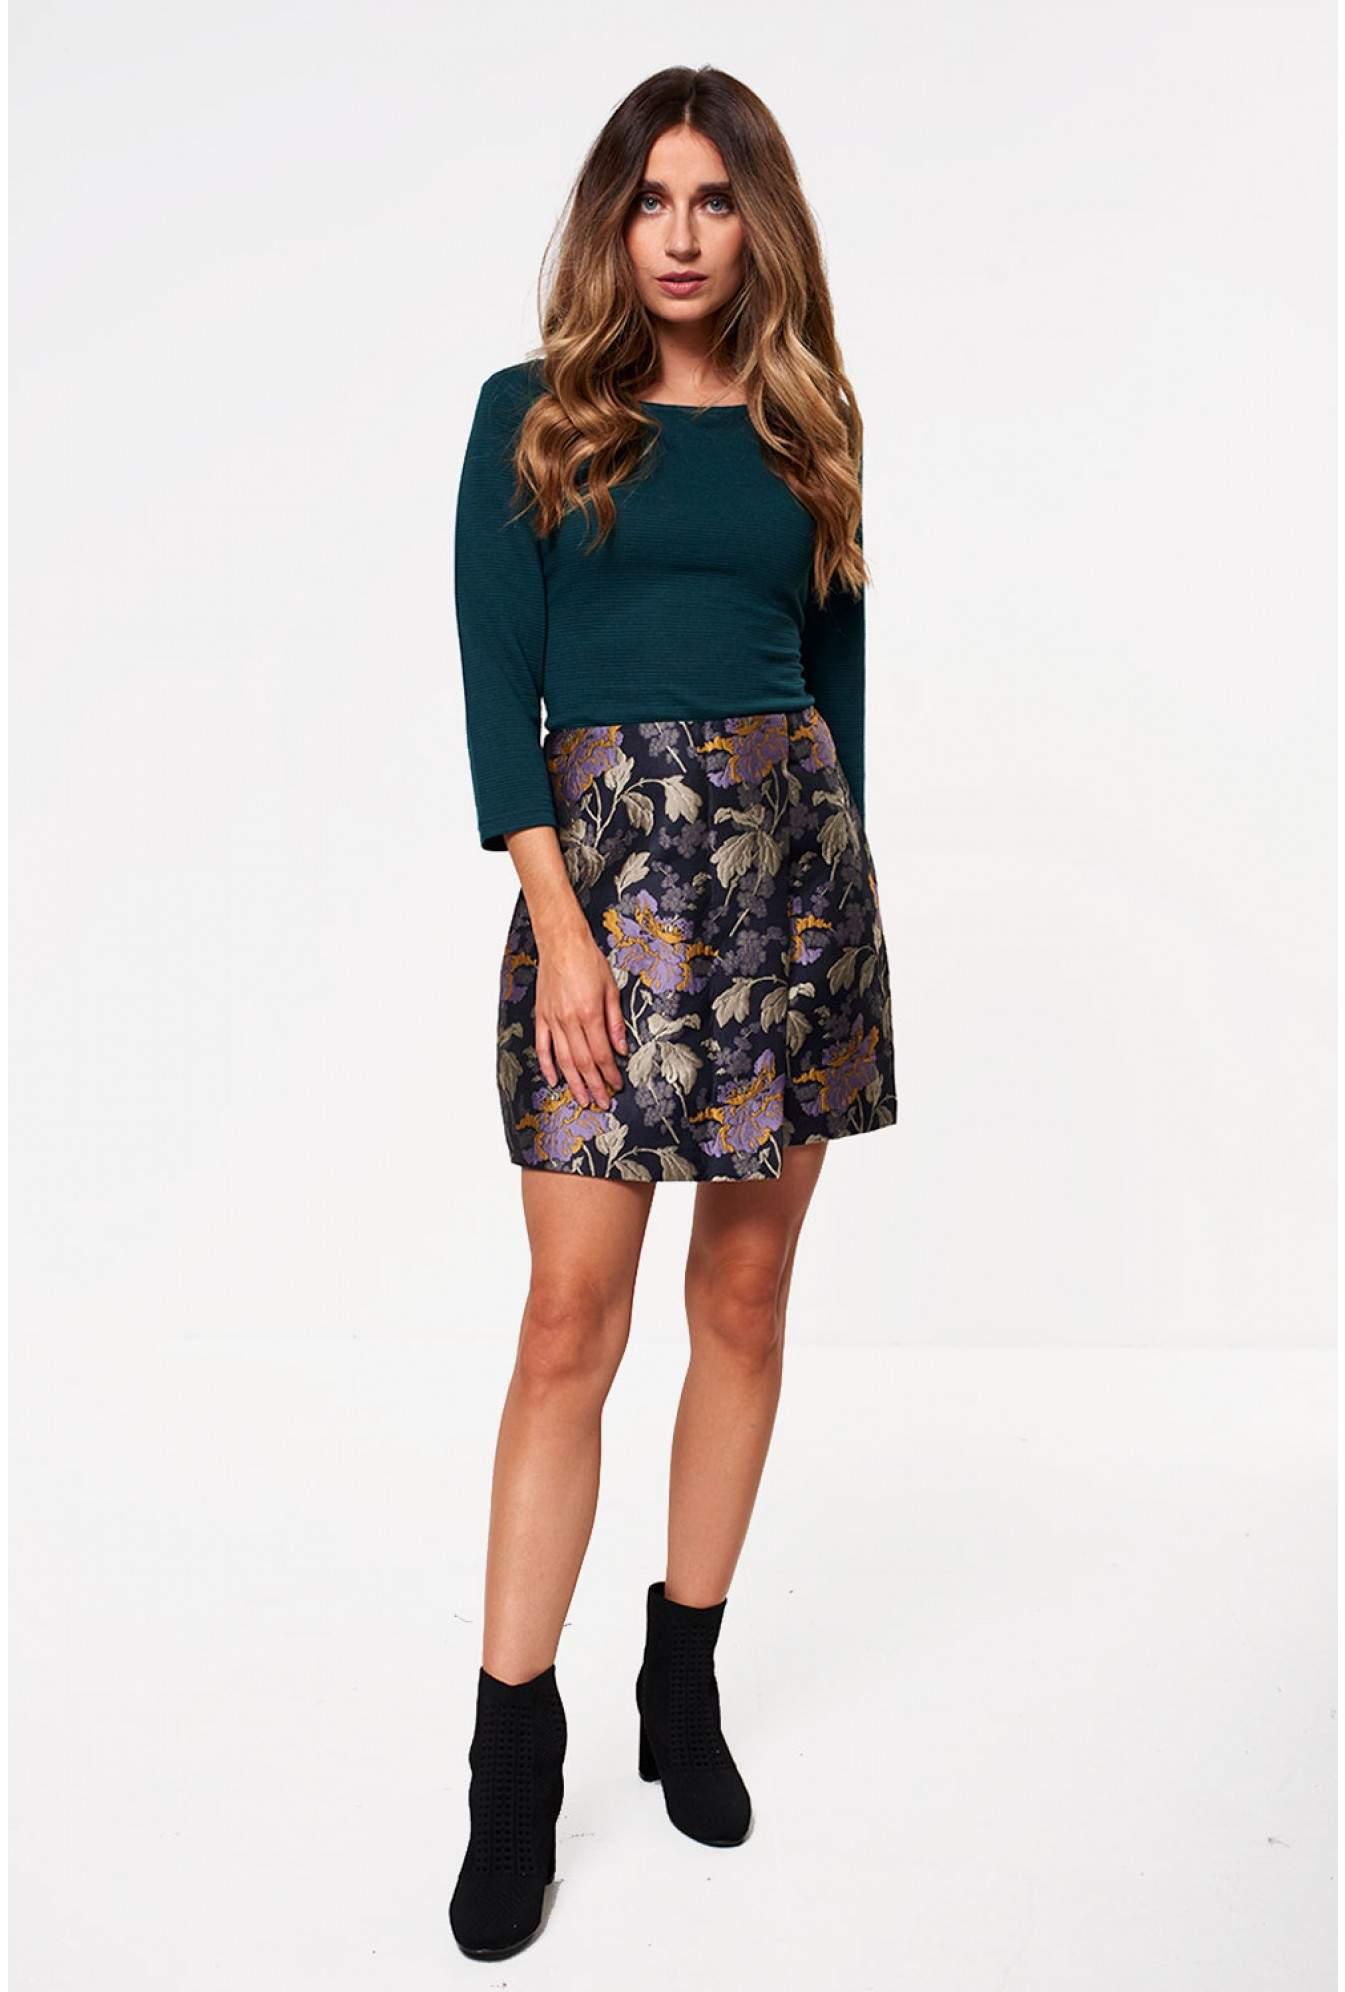 706755d40d5b More Views. Freya Jacquard Short Skirt